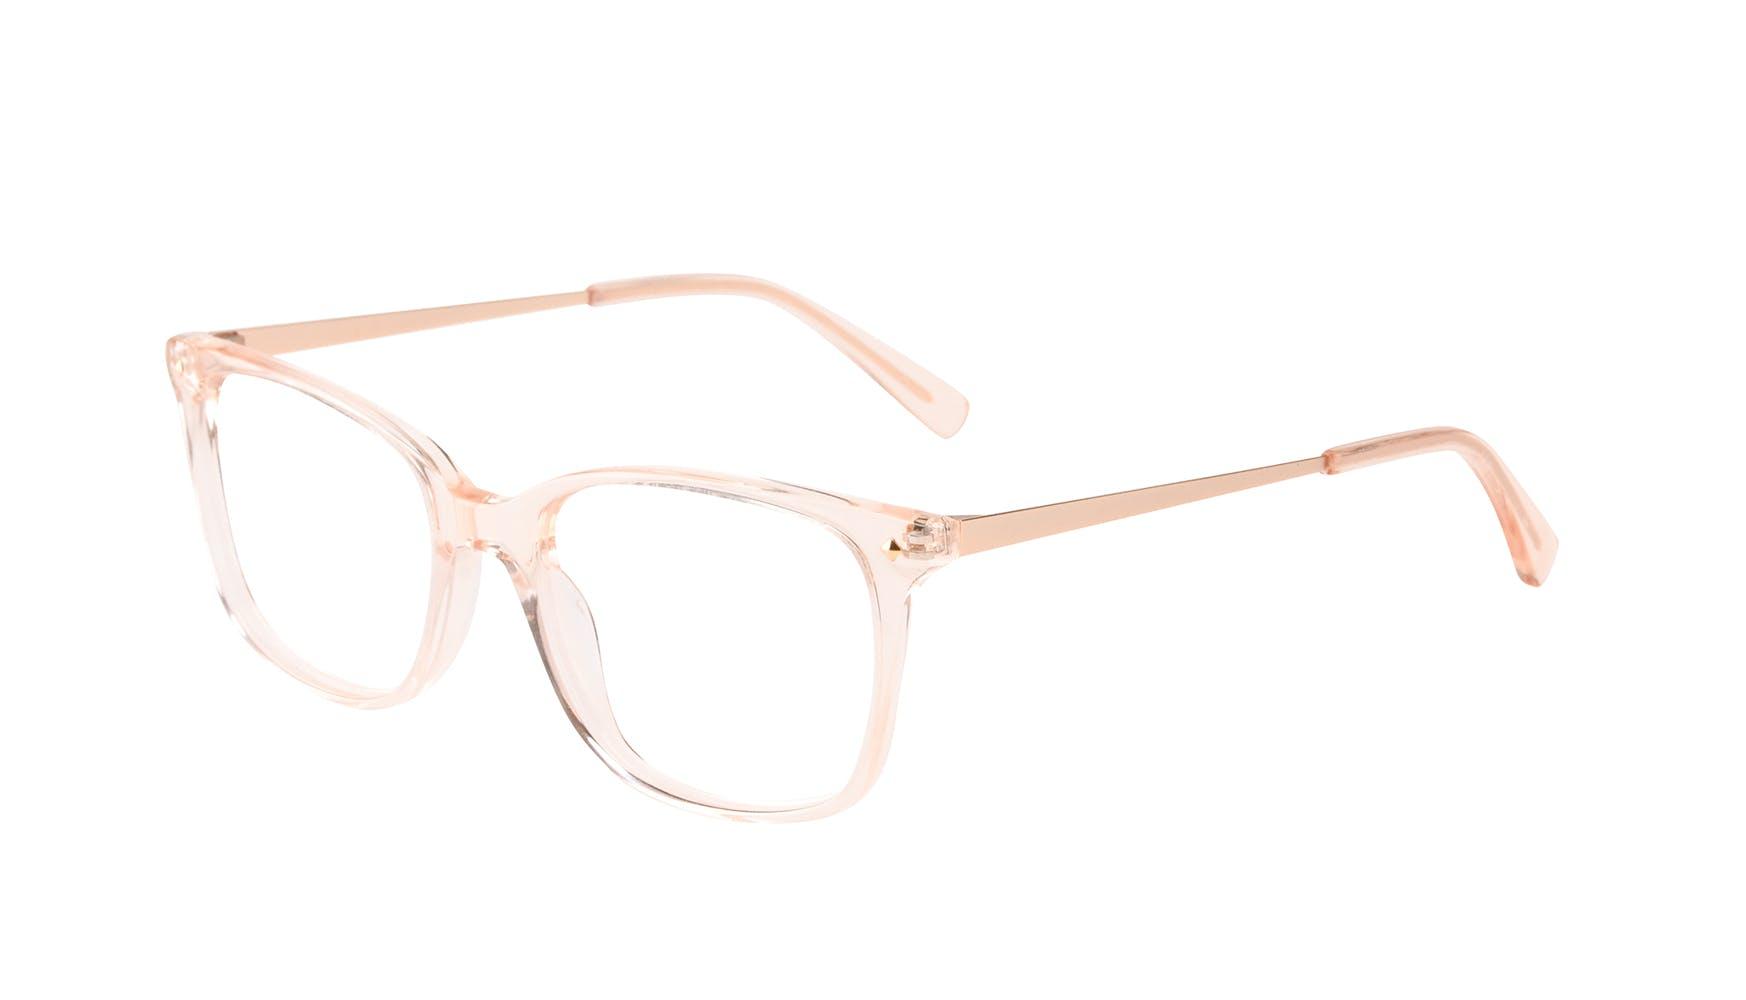 Affordable Fashion Glasses Rectangle Square Eyeglasses Women Refine Blond Tilt